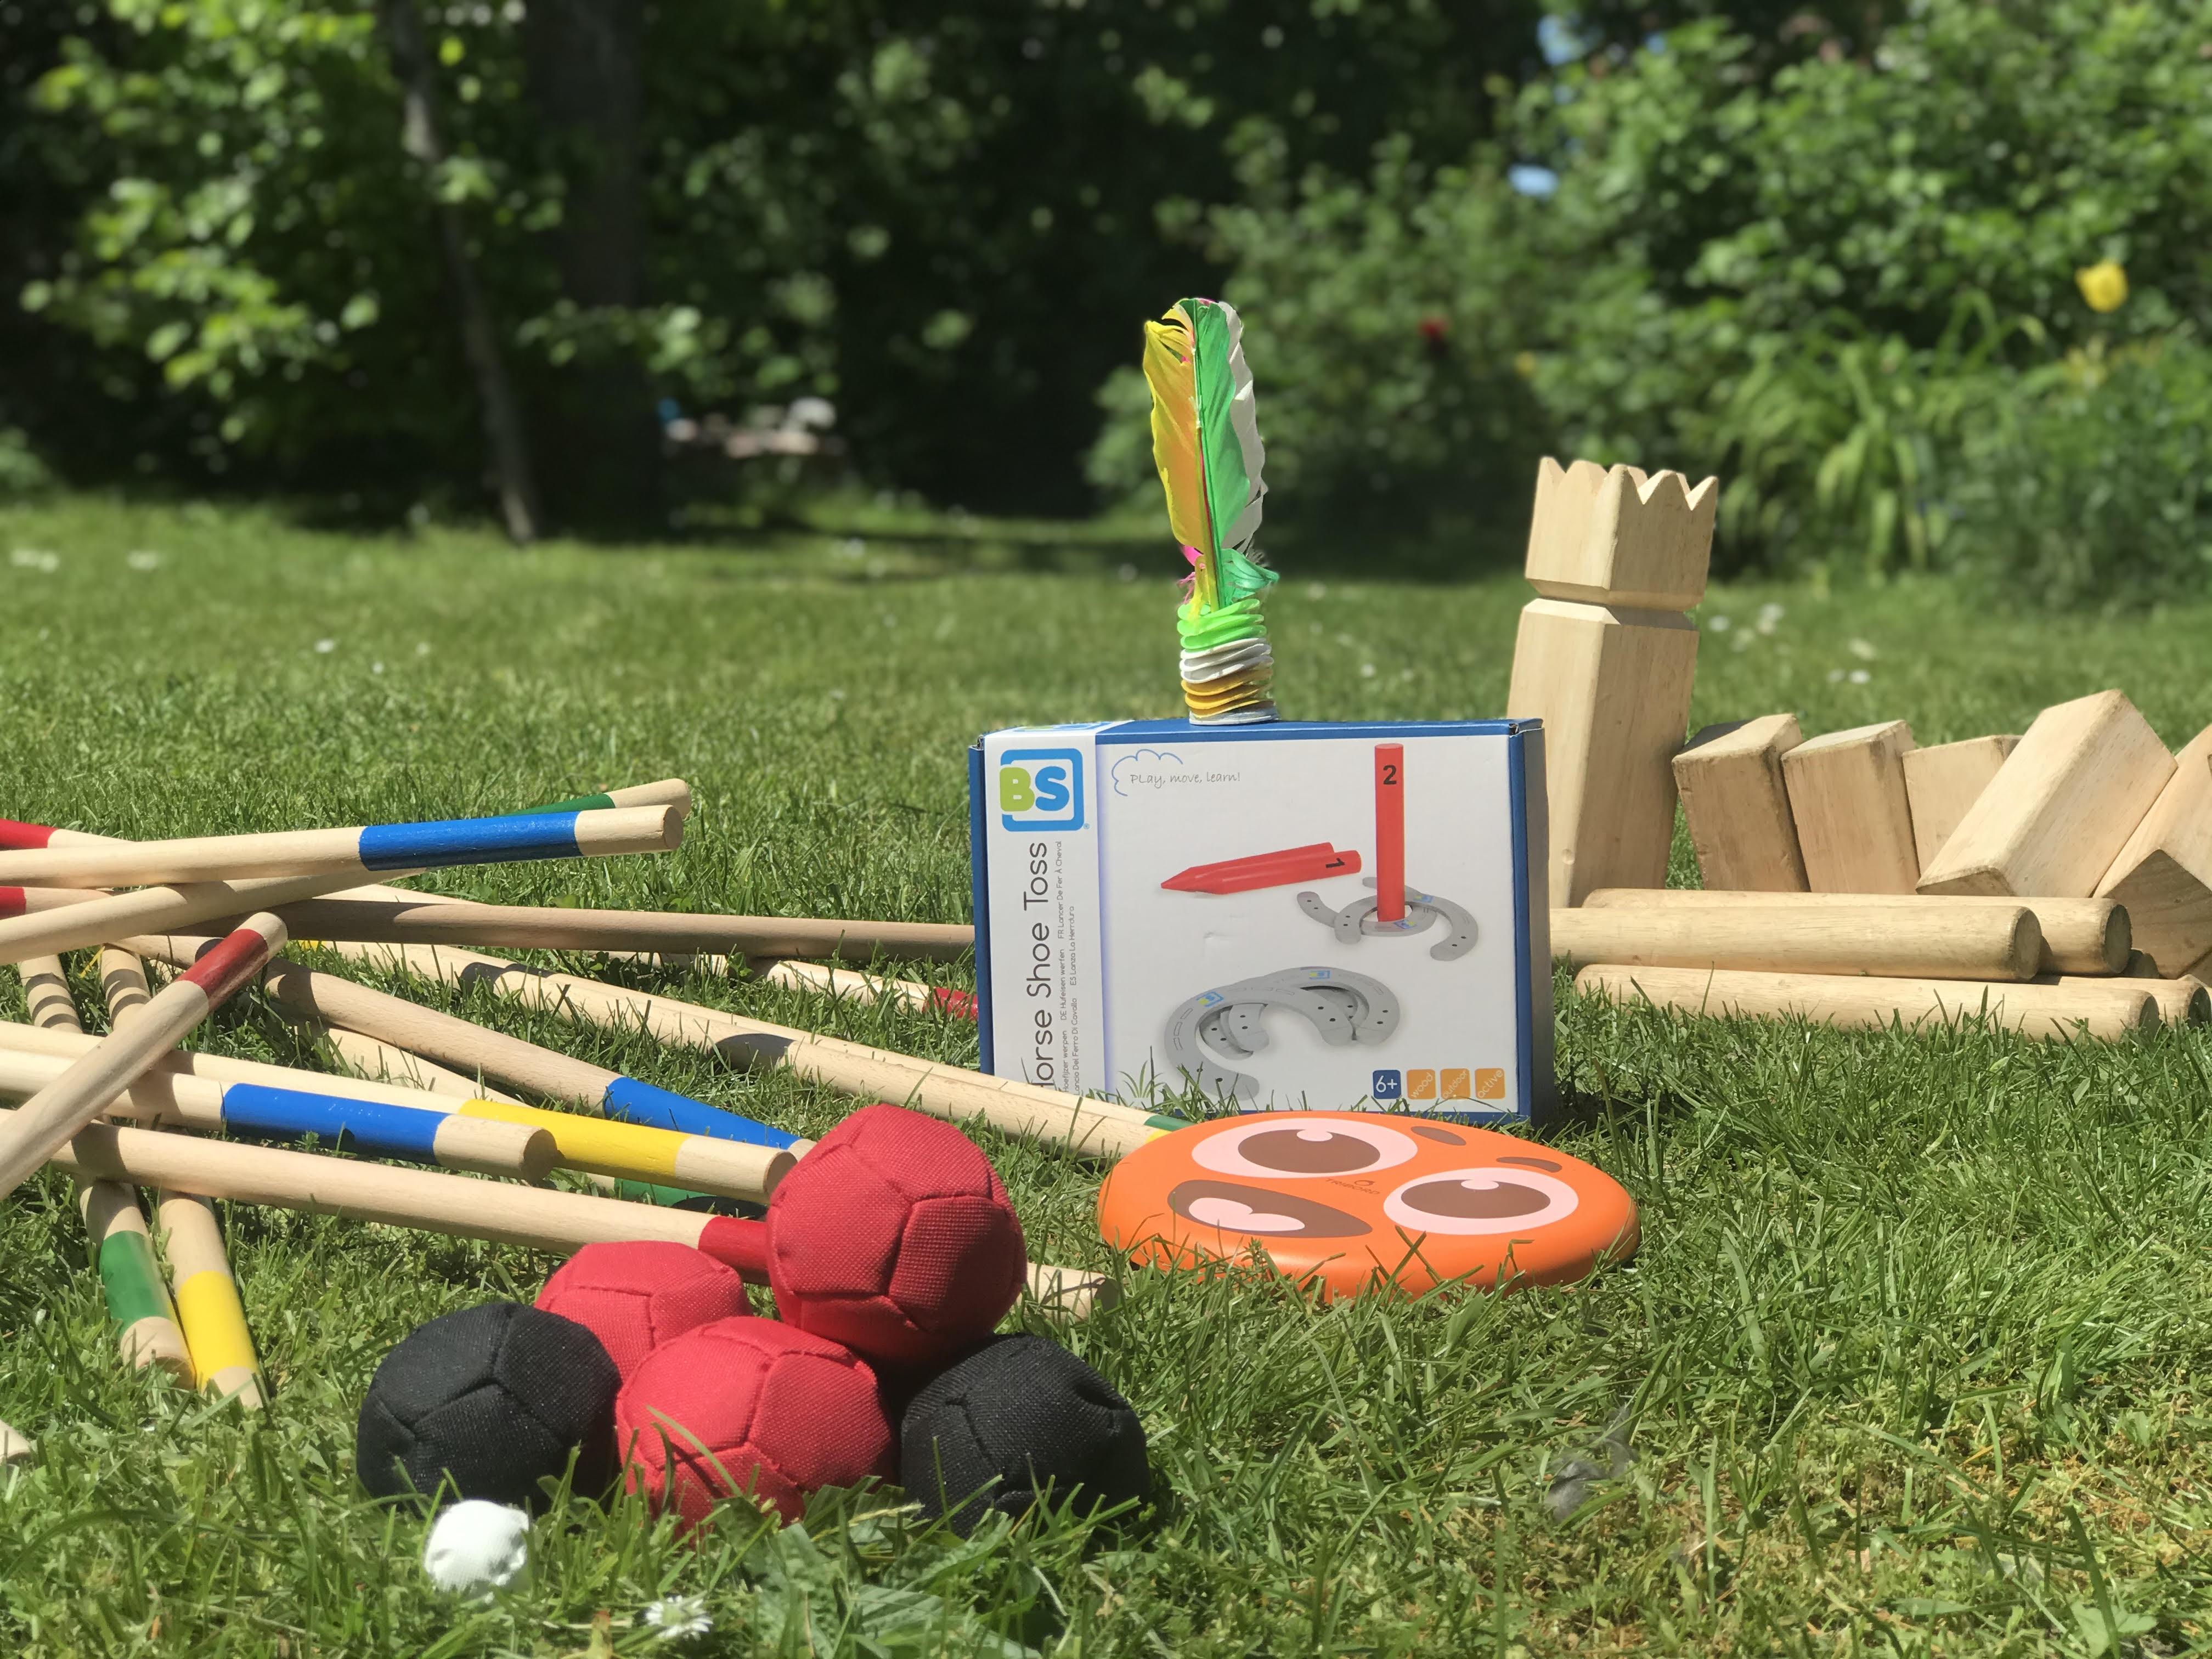 Naše výbava zahradních her